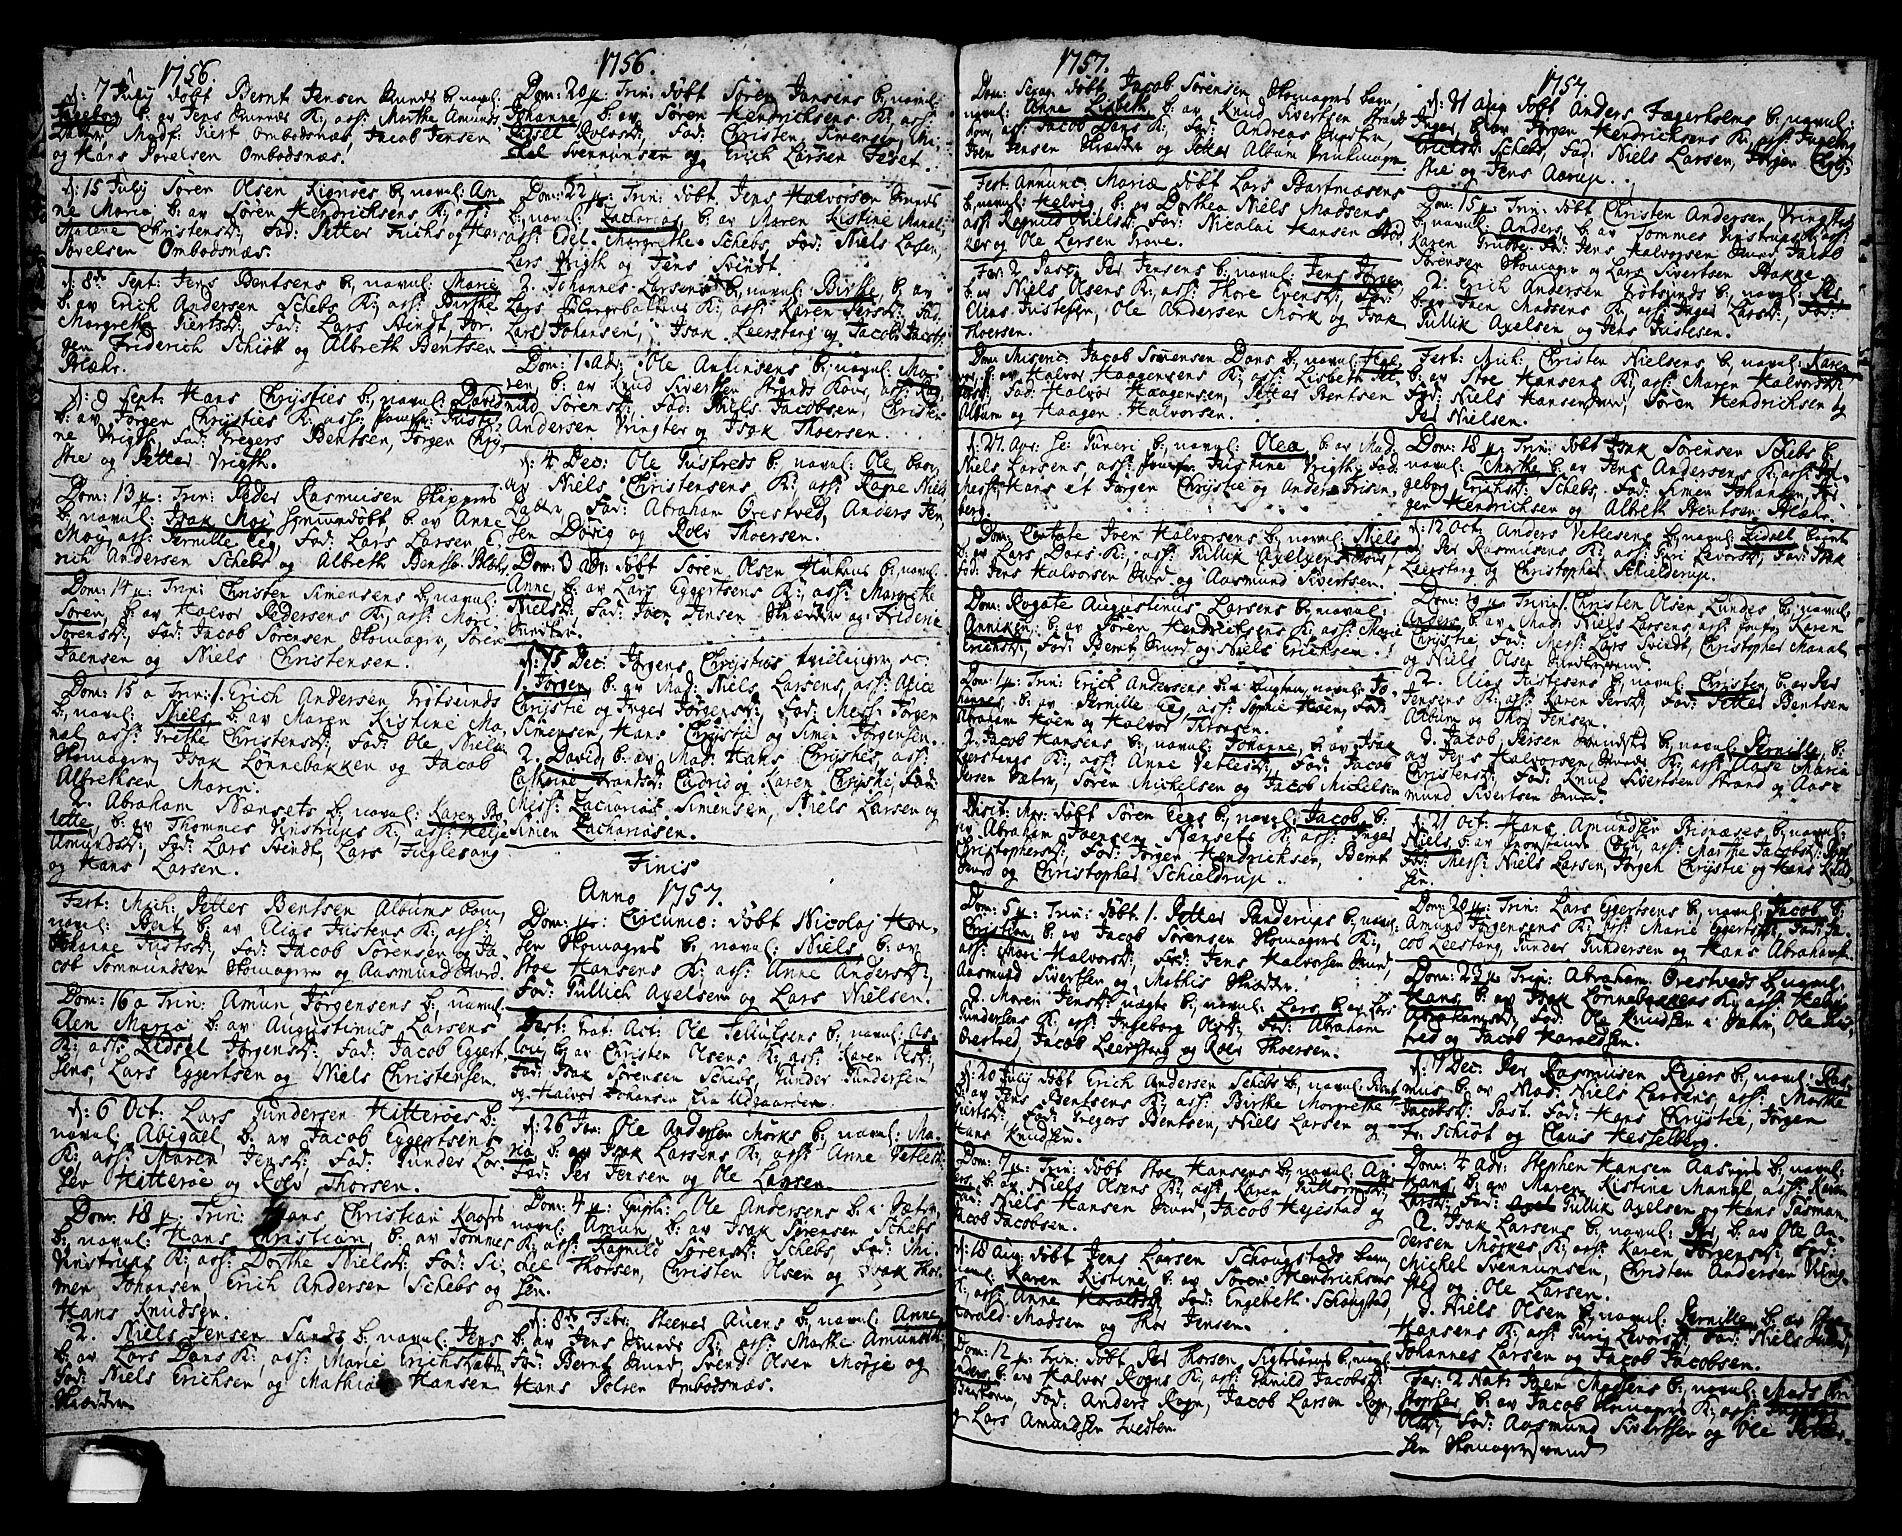 SAKO, Brevik kirkebøker, F/Fa/L0002: Ministerialbok nr. 2, 1720-1764, s. 35e